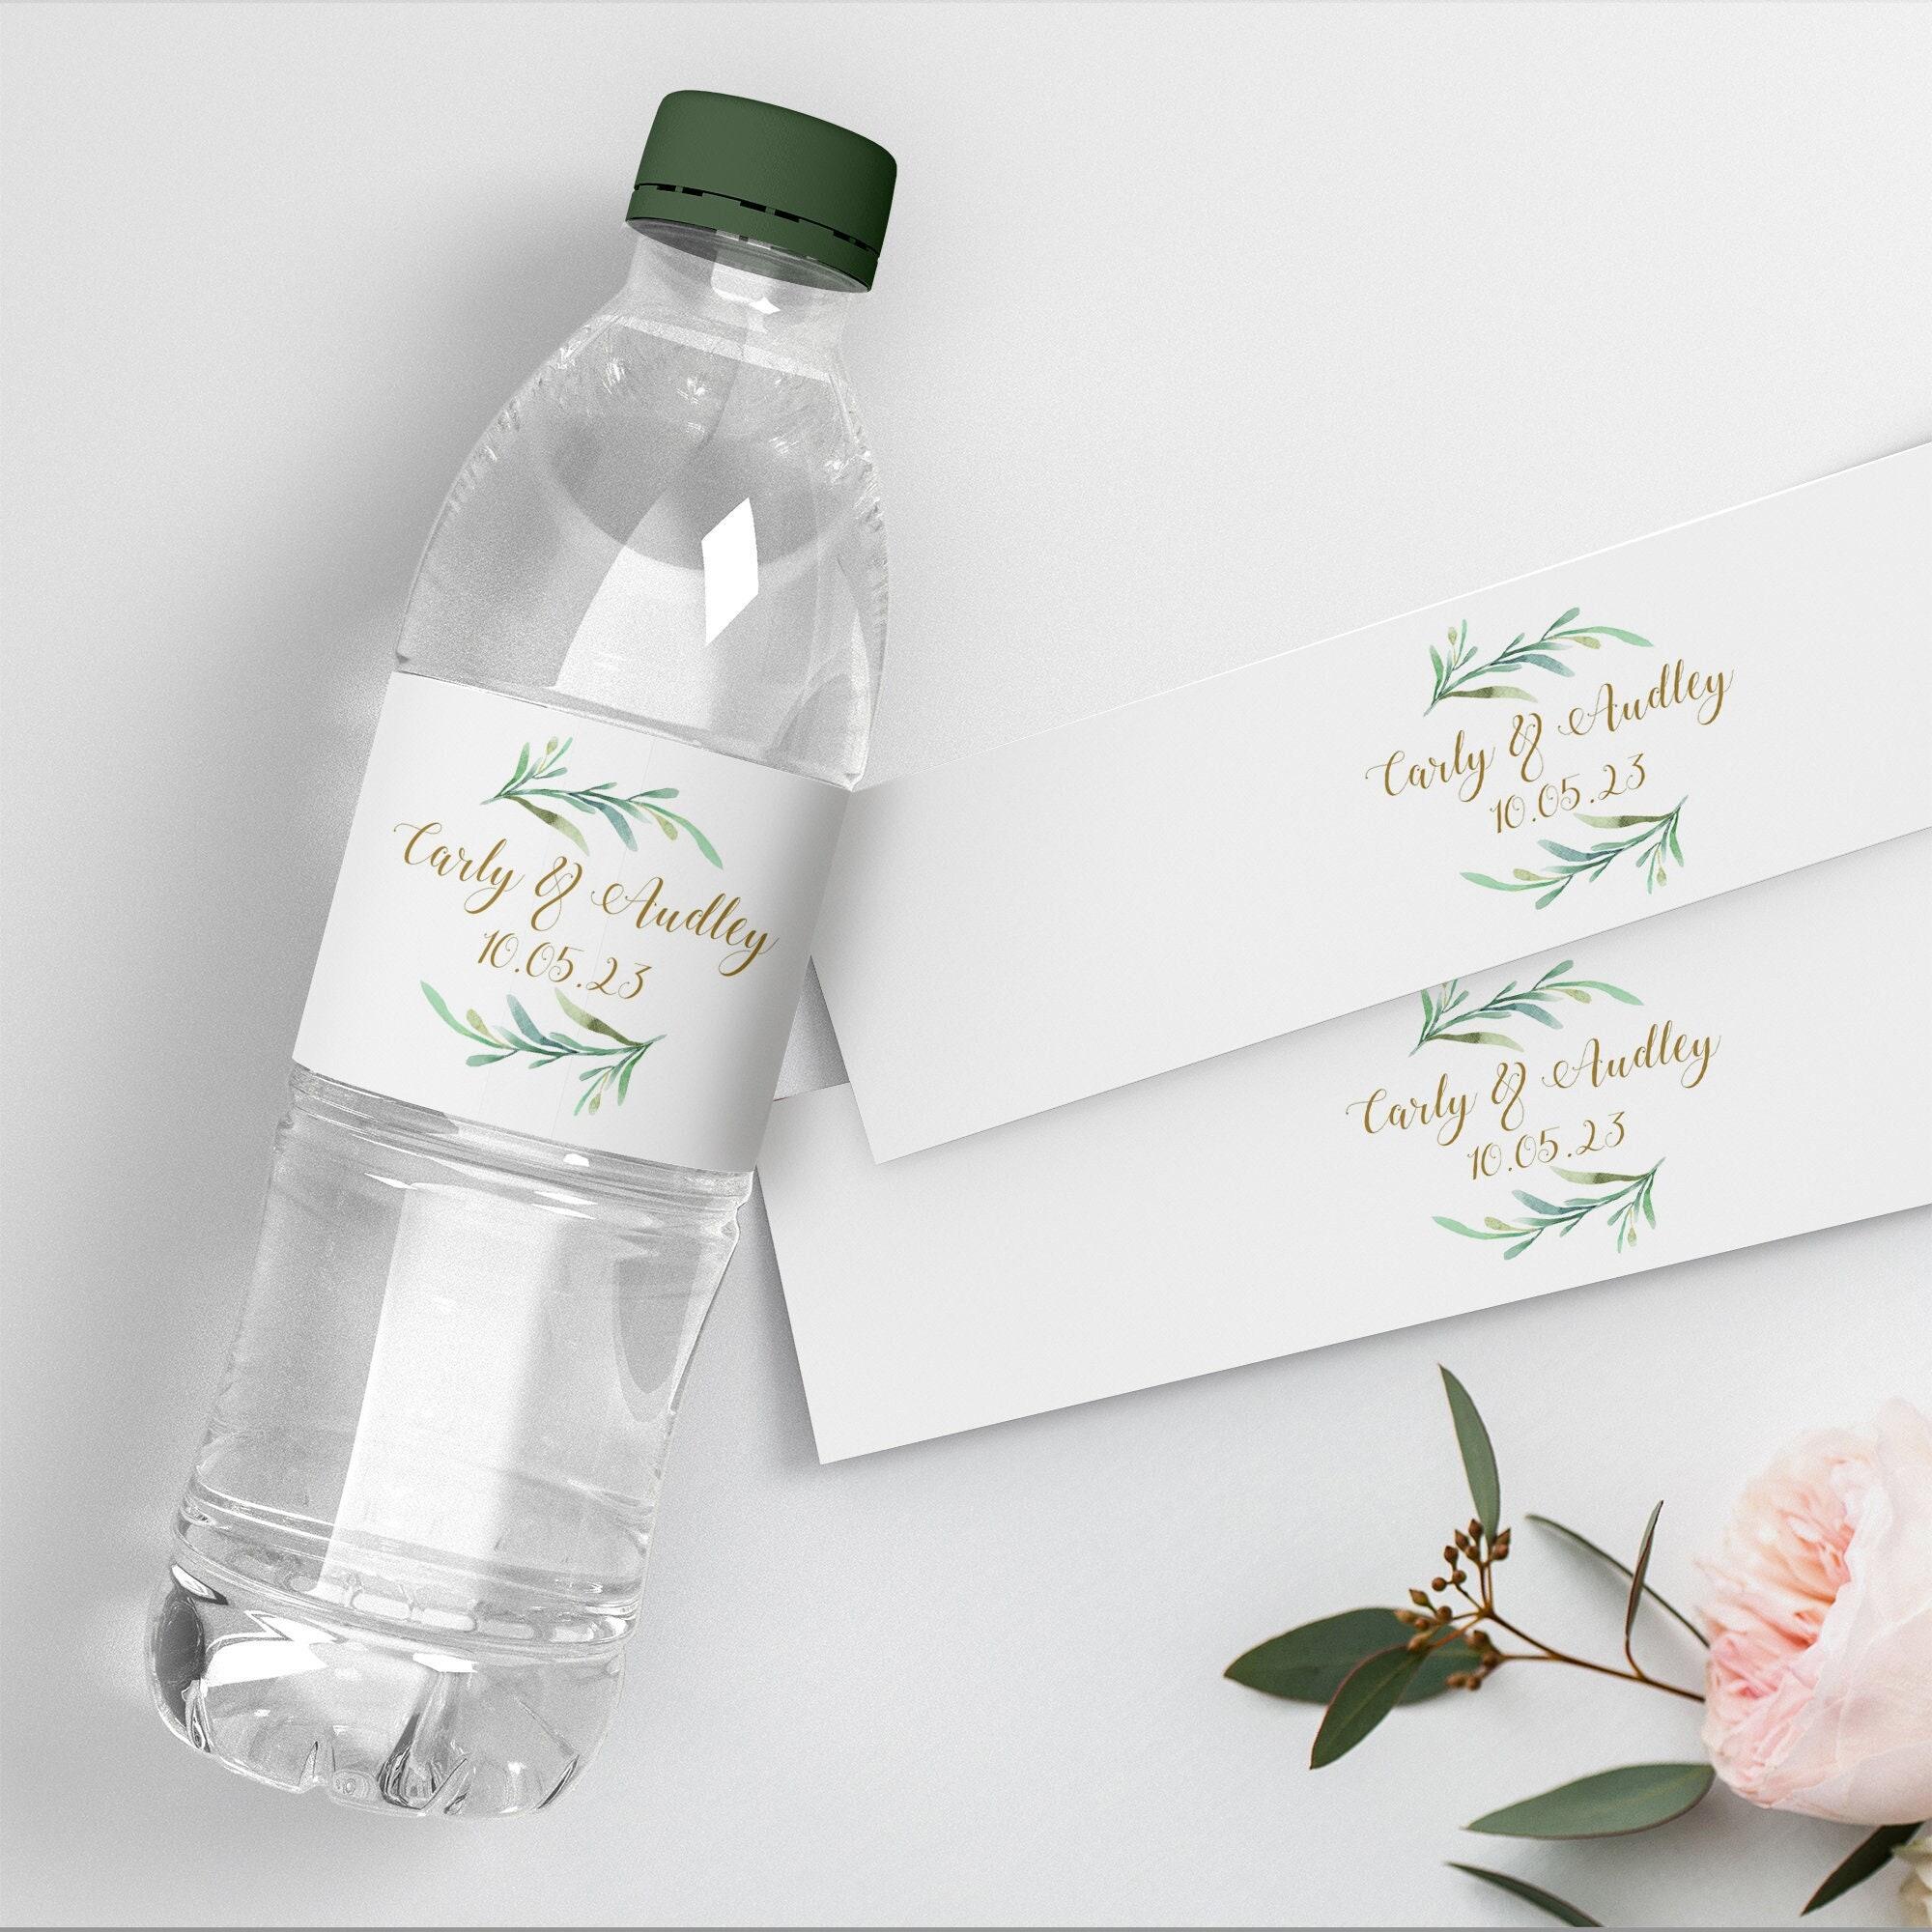 Water Bottle Label Diy Printable Wedding Water Bottle Labels 2 Greenery Printable Bottle Label Template Corjl Template Free Demo